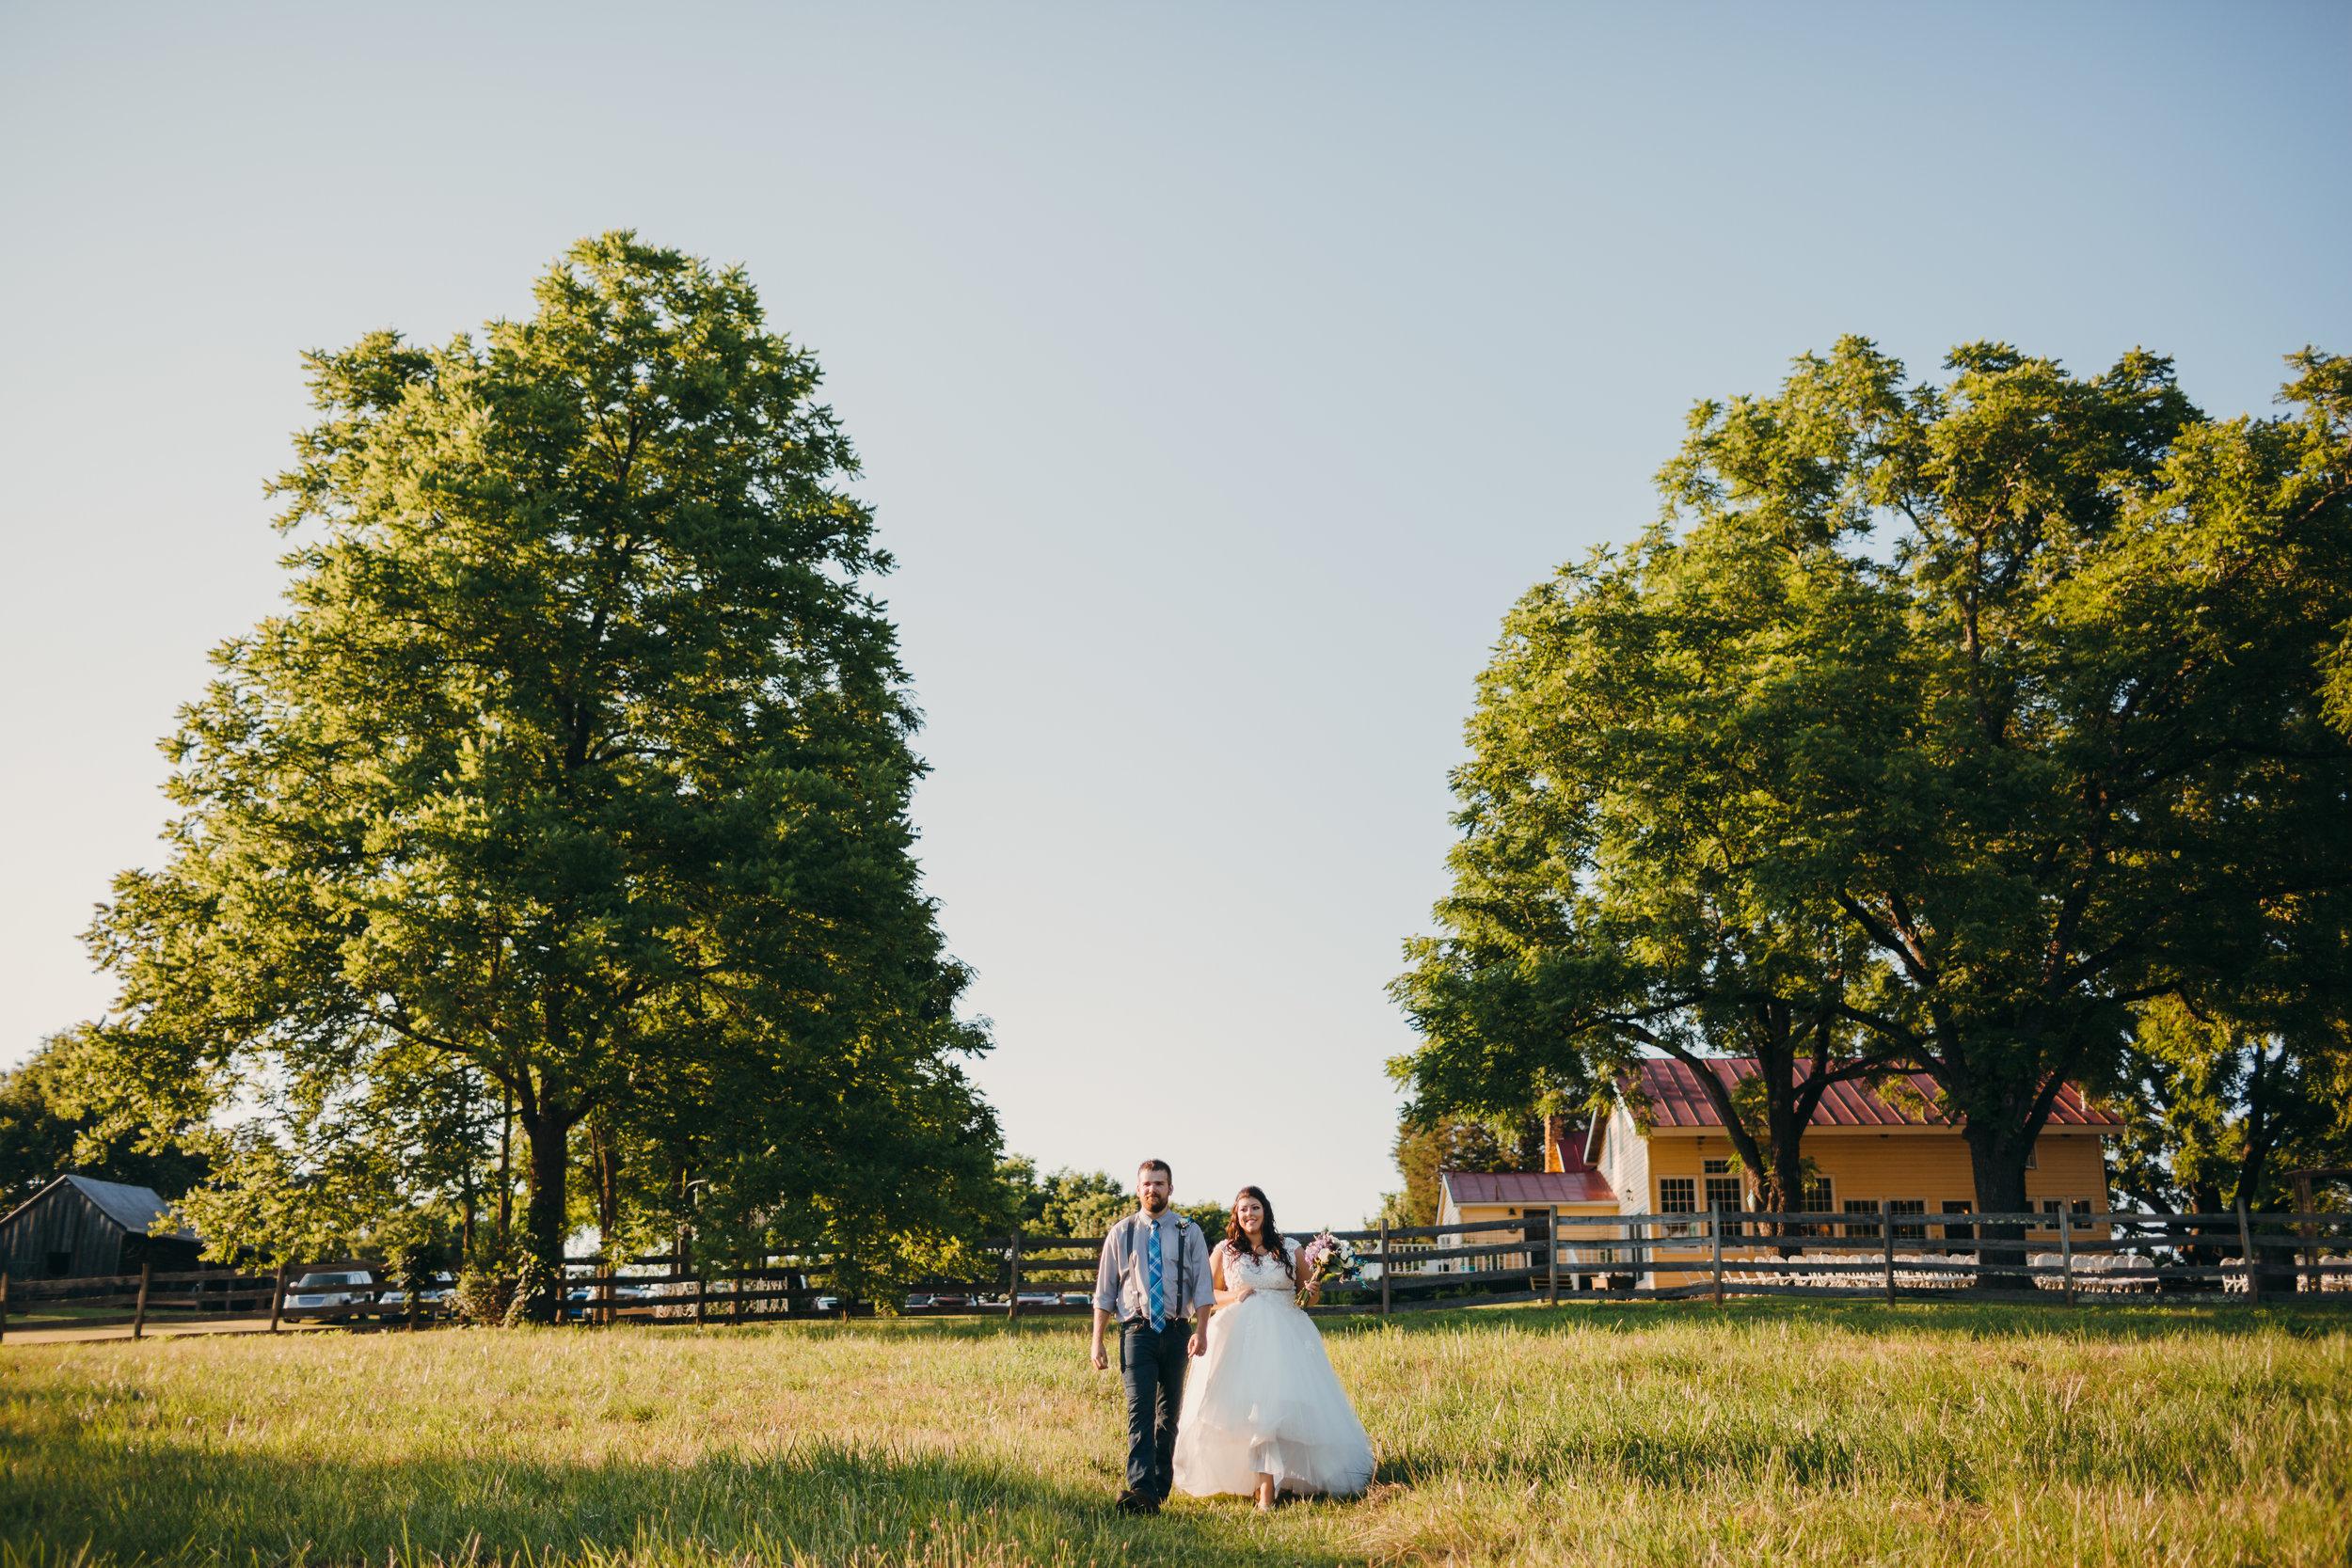 Sorella Farms_Lynchburg Wedding Photographer_Lynchburg Wedding Venue_Lynchburg Photographer-28.jpg